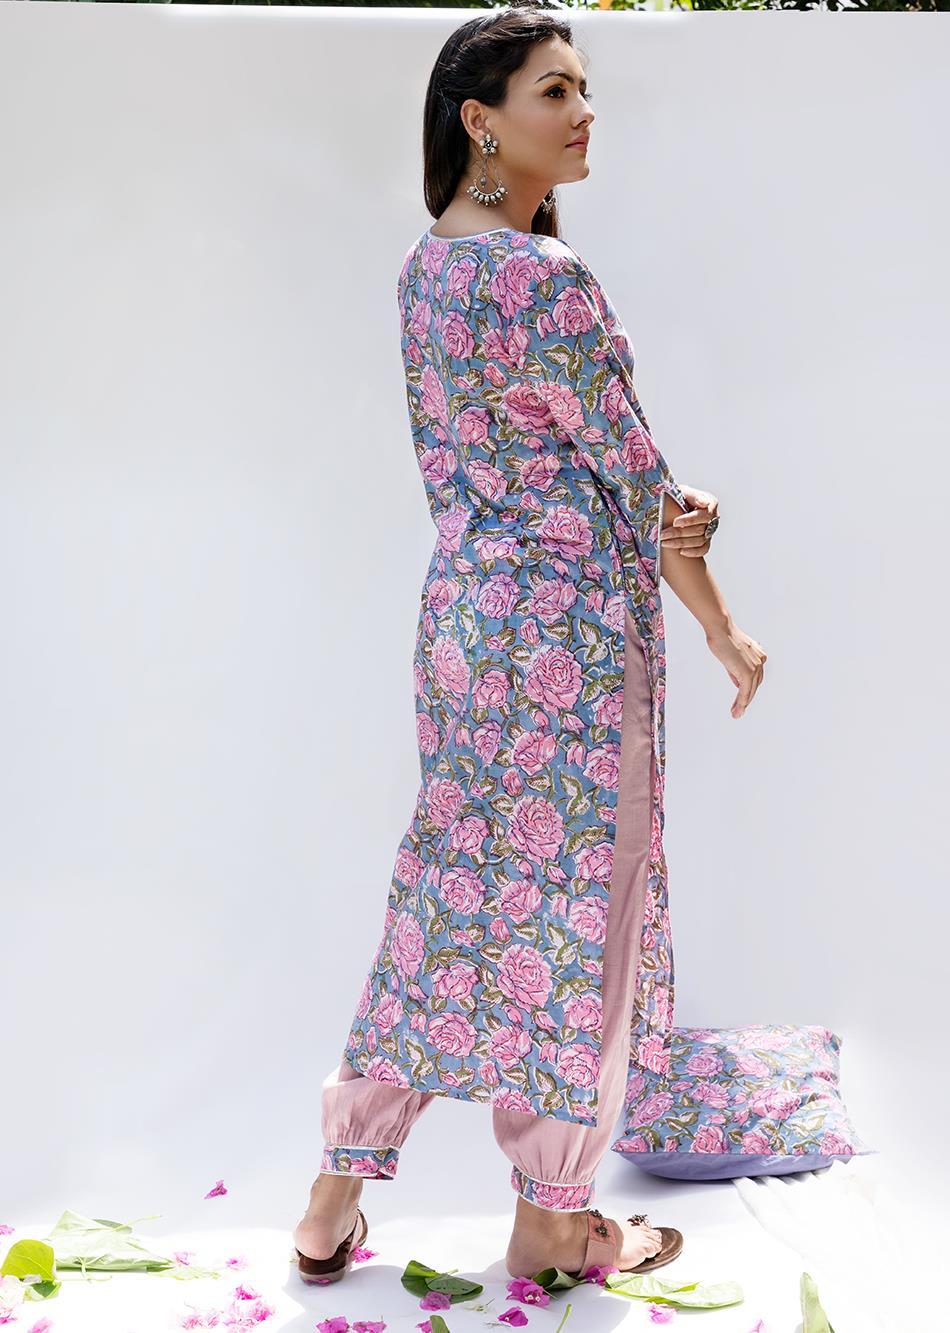 Gulabi loose kurta with pants (Set of 3) By Jovi Fashion